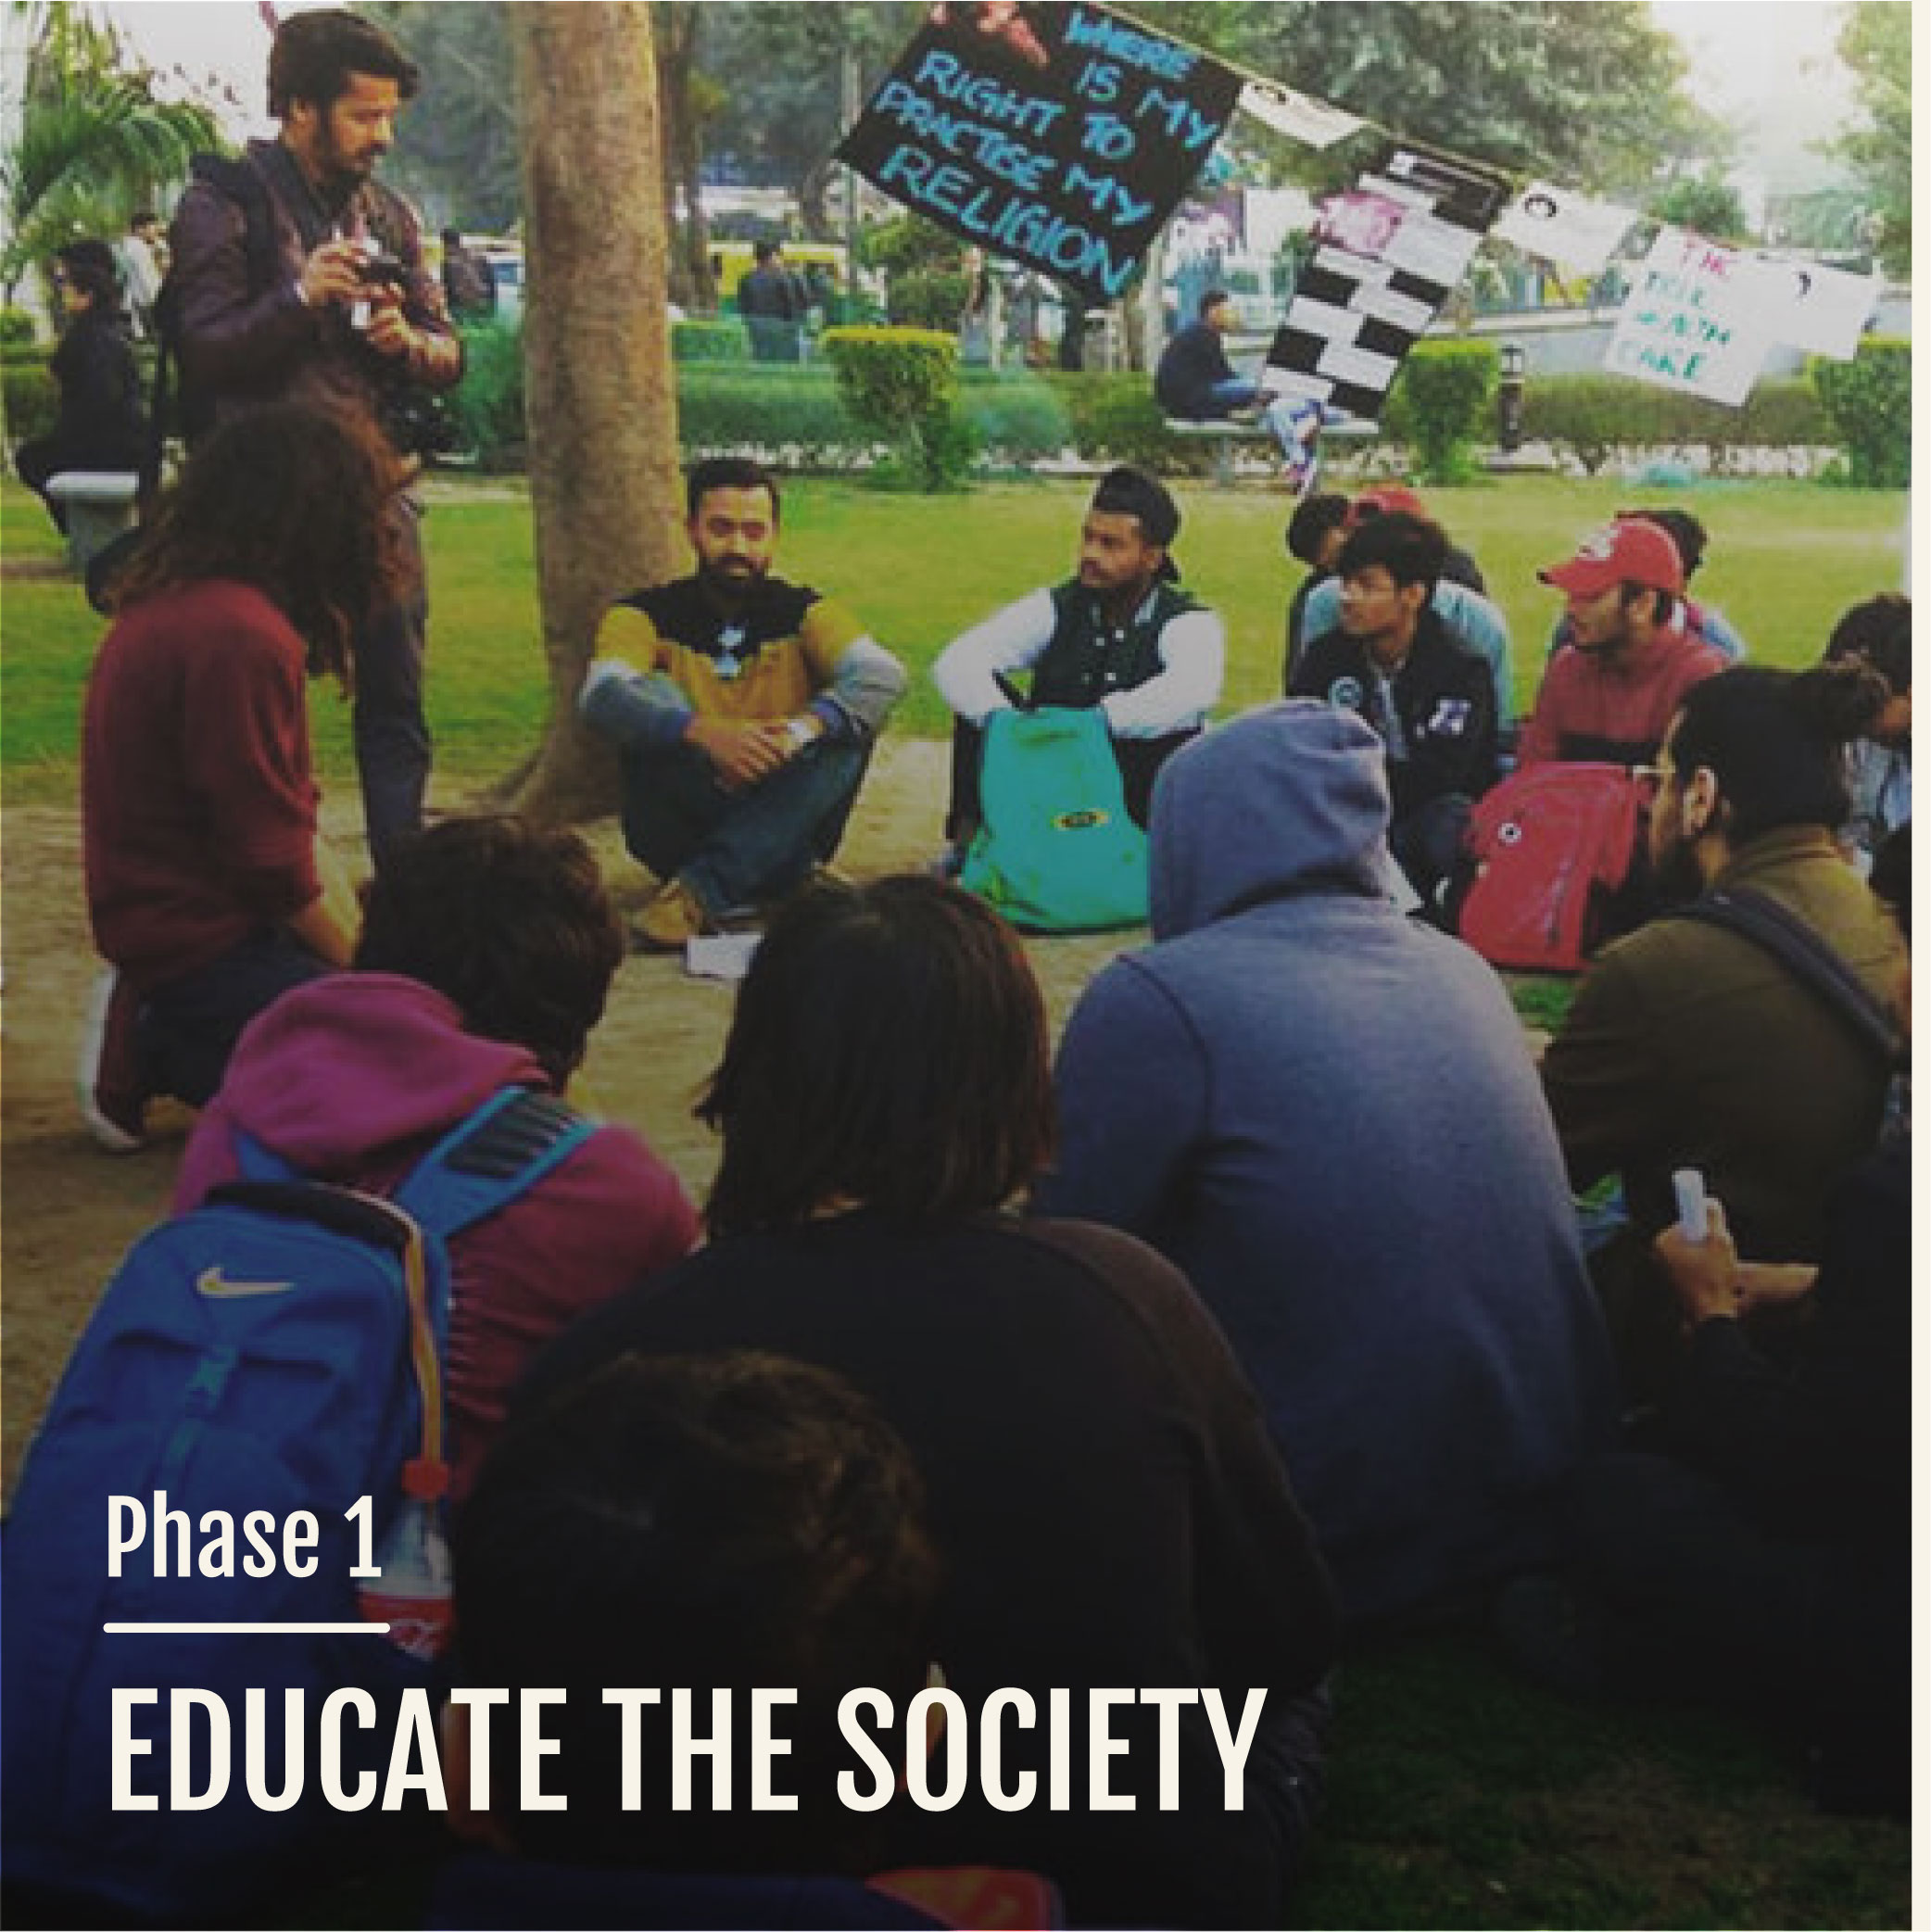 walk-the-talk-educate-2.jpg